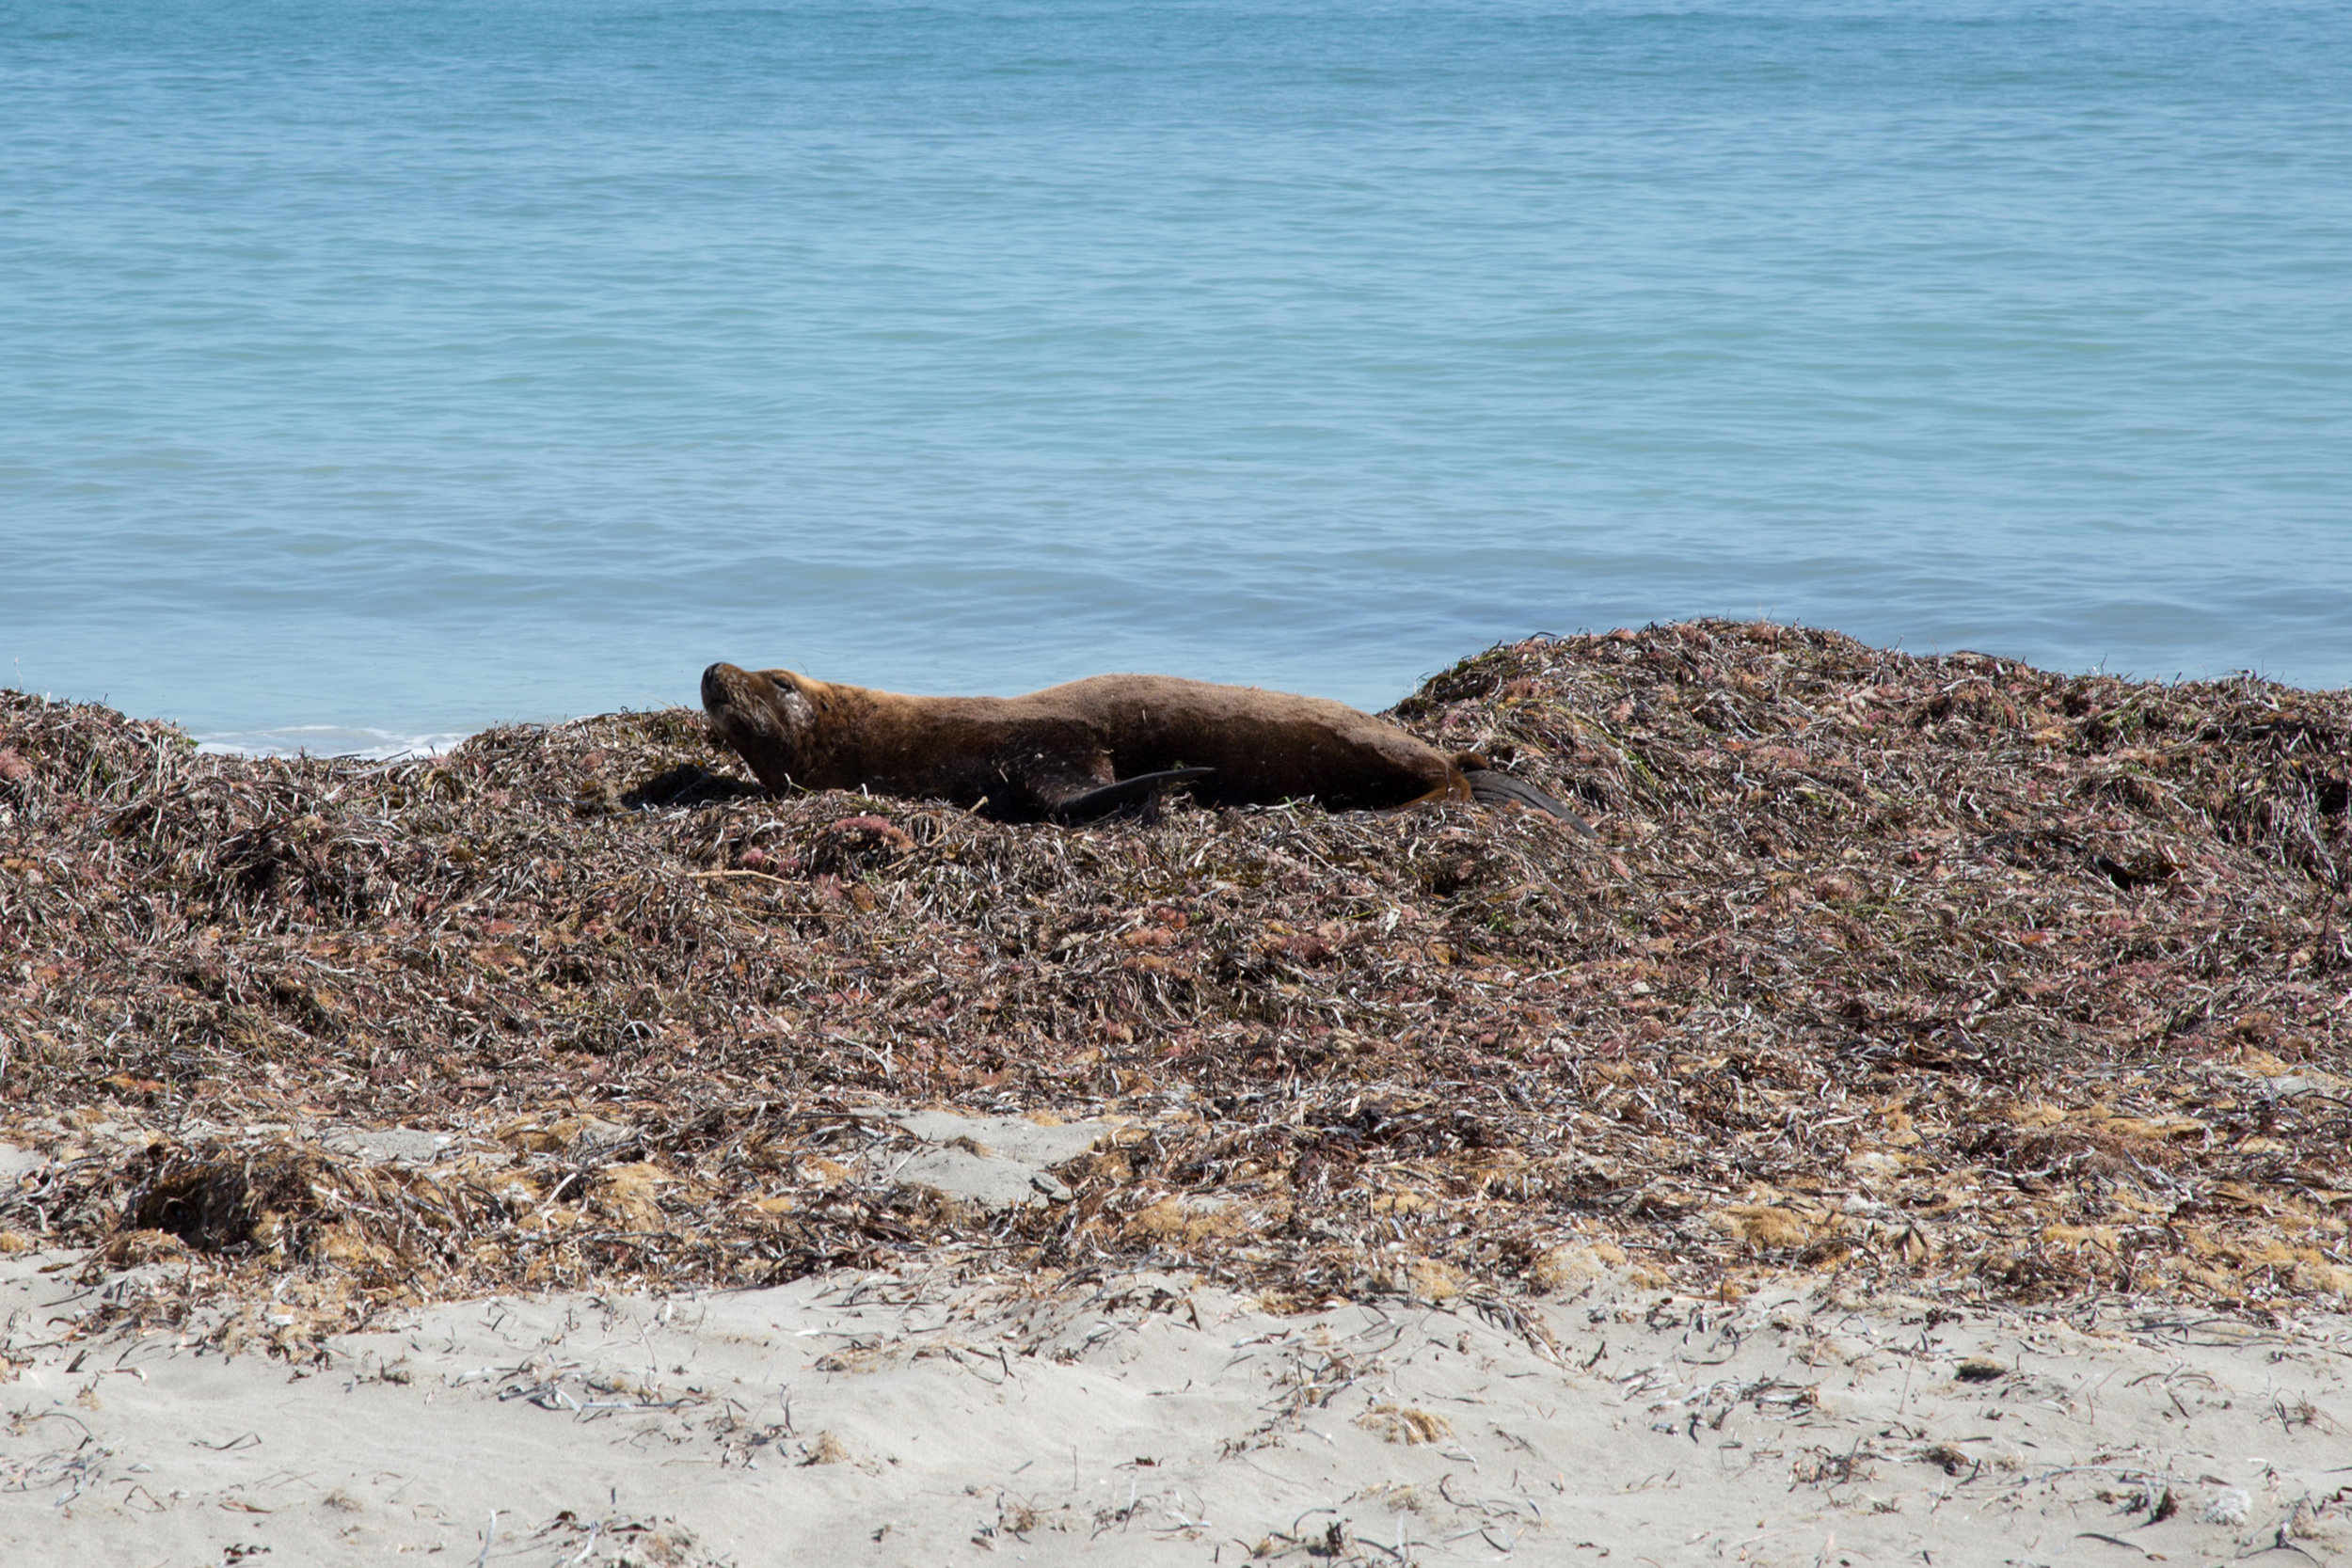 Plate 9: Seal on the beach near Becher Point.